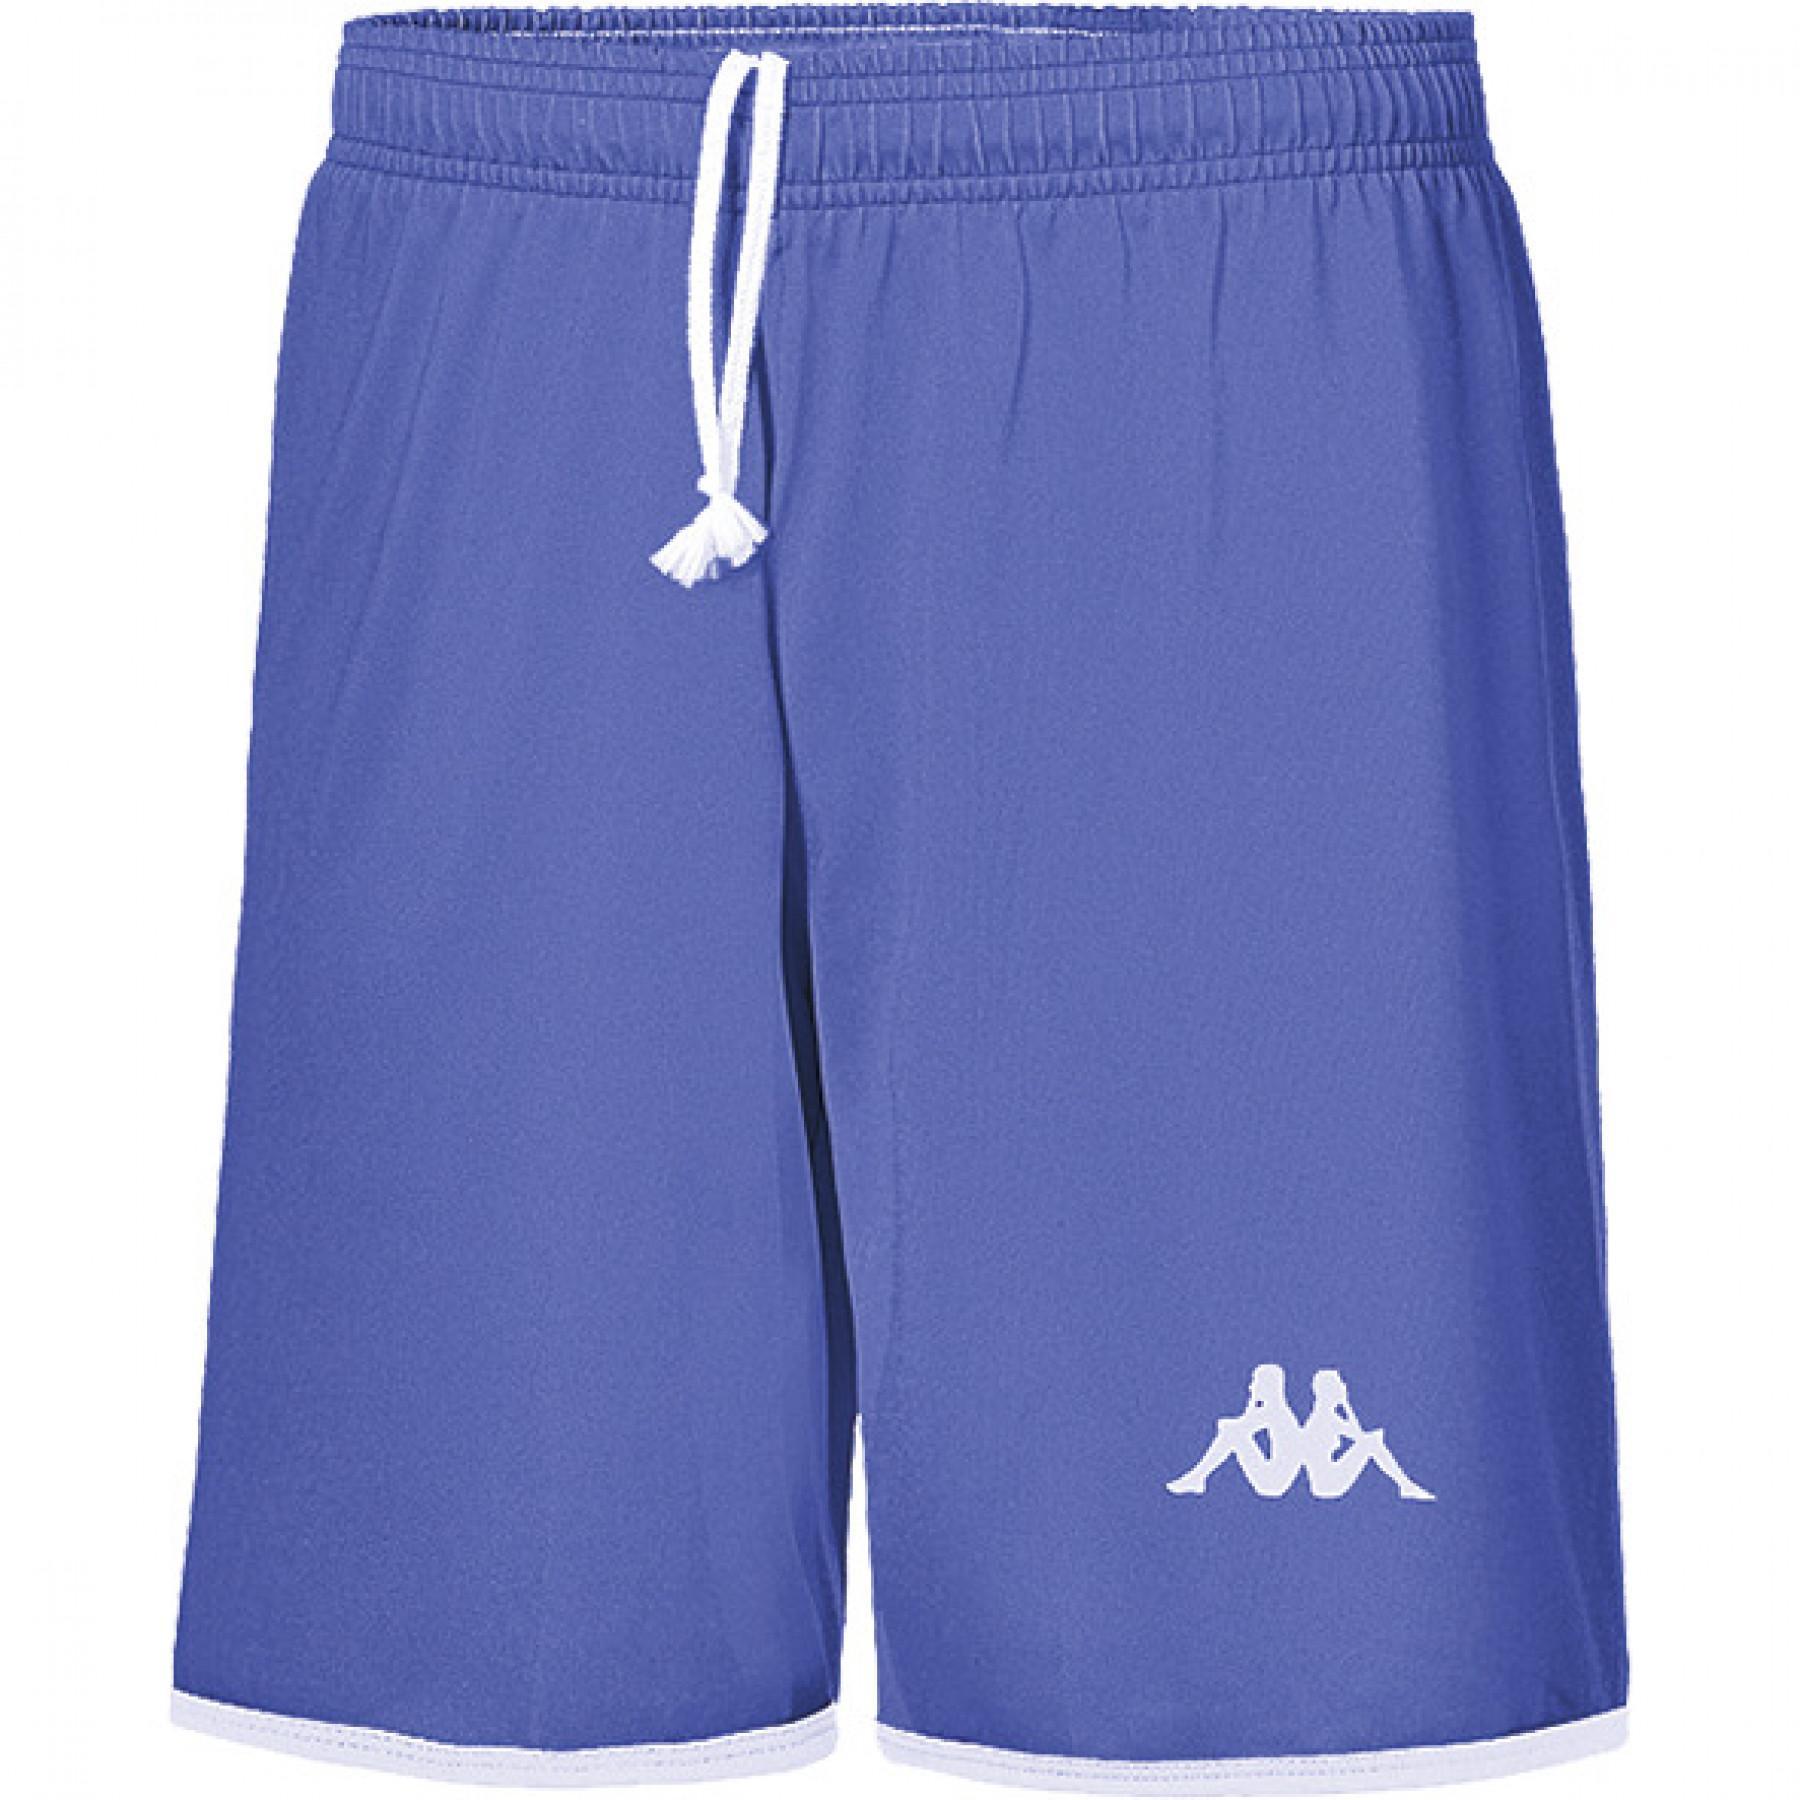 Women's basketball shorts Kappa Norcia